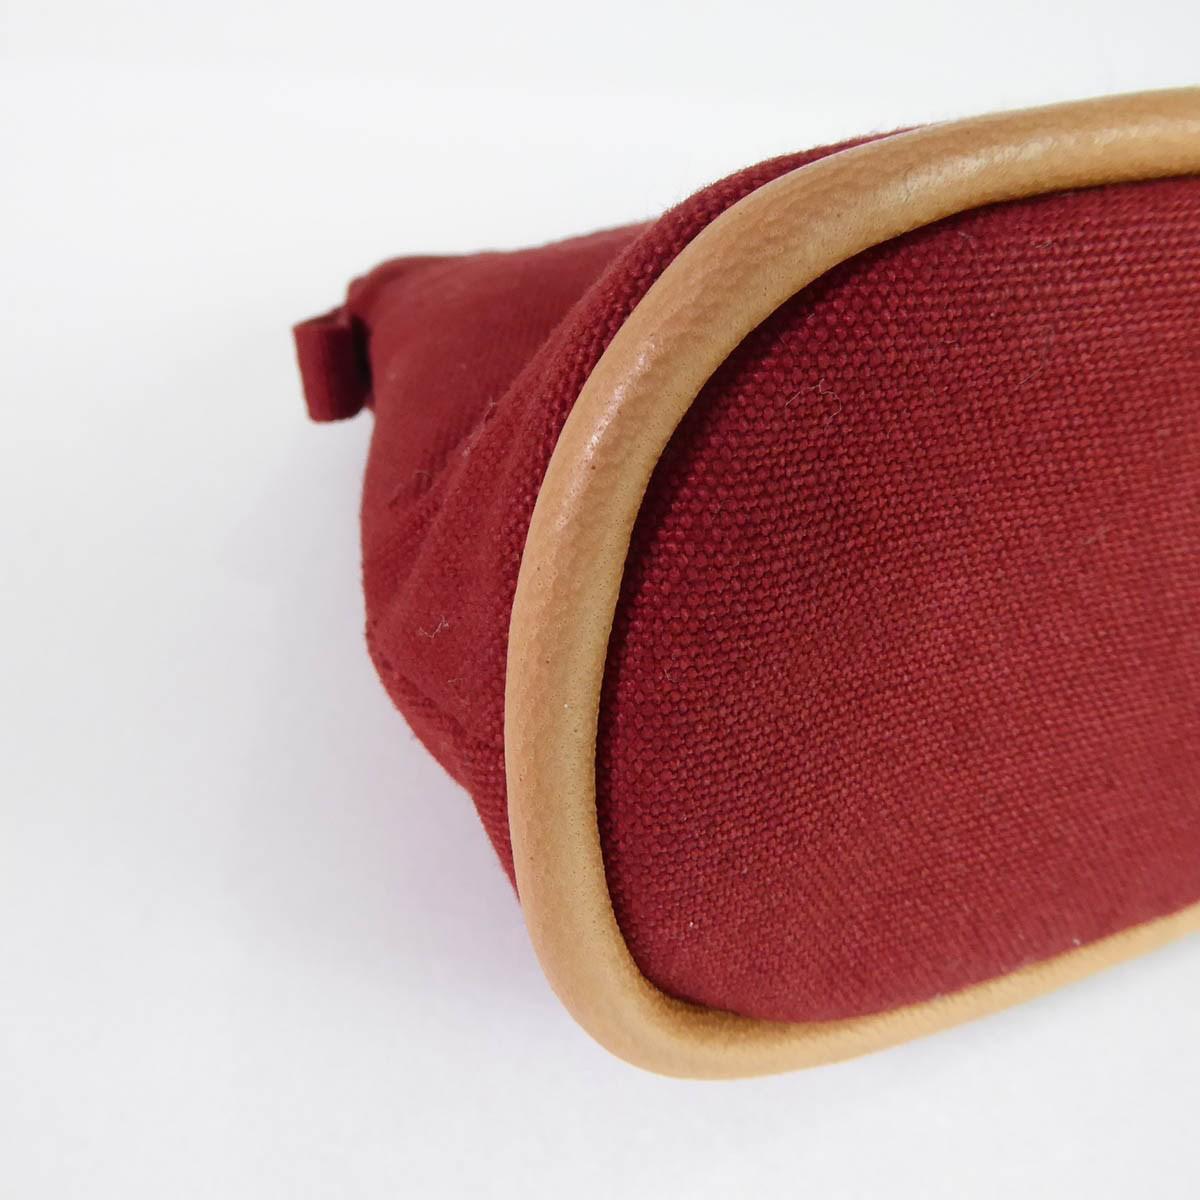 329468094d49 Lyst - Hermès Bolide Wallet in Red